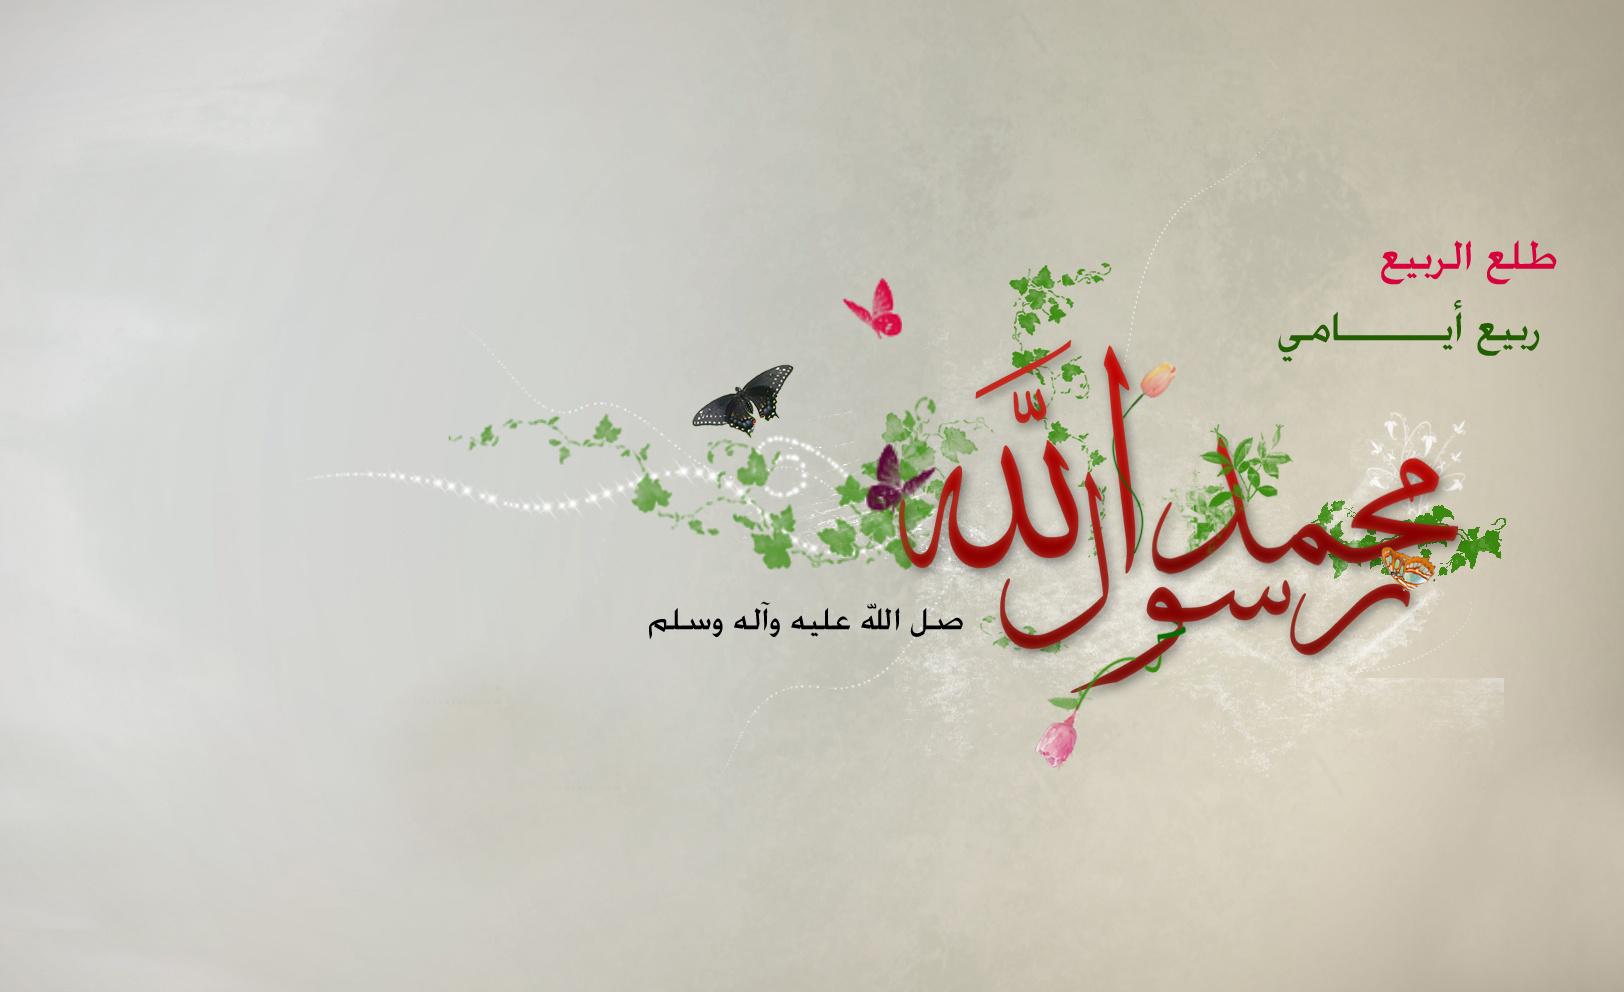 http://www.sibtayn.com/swf/gallery/images/monasebat/veladat/mohammad/pic3/pic6.jpg